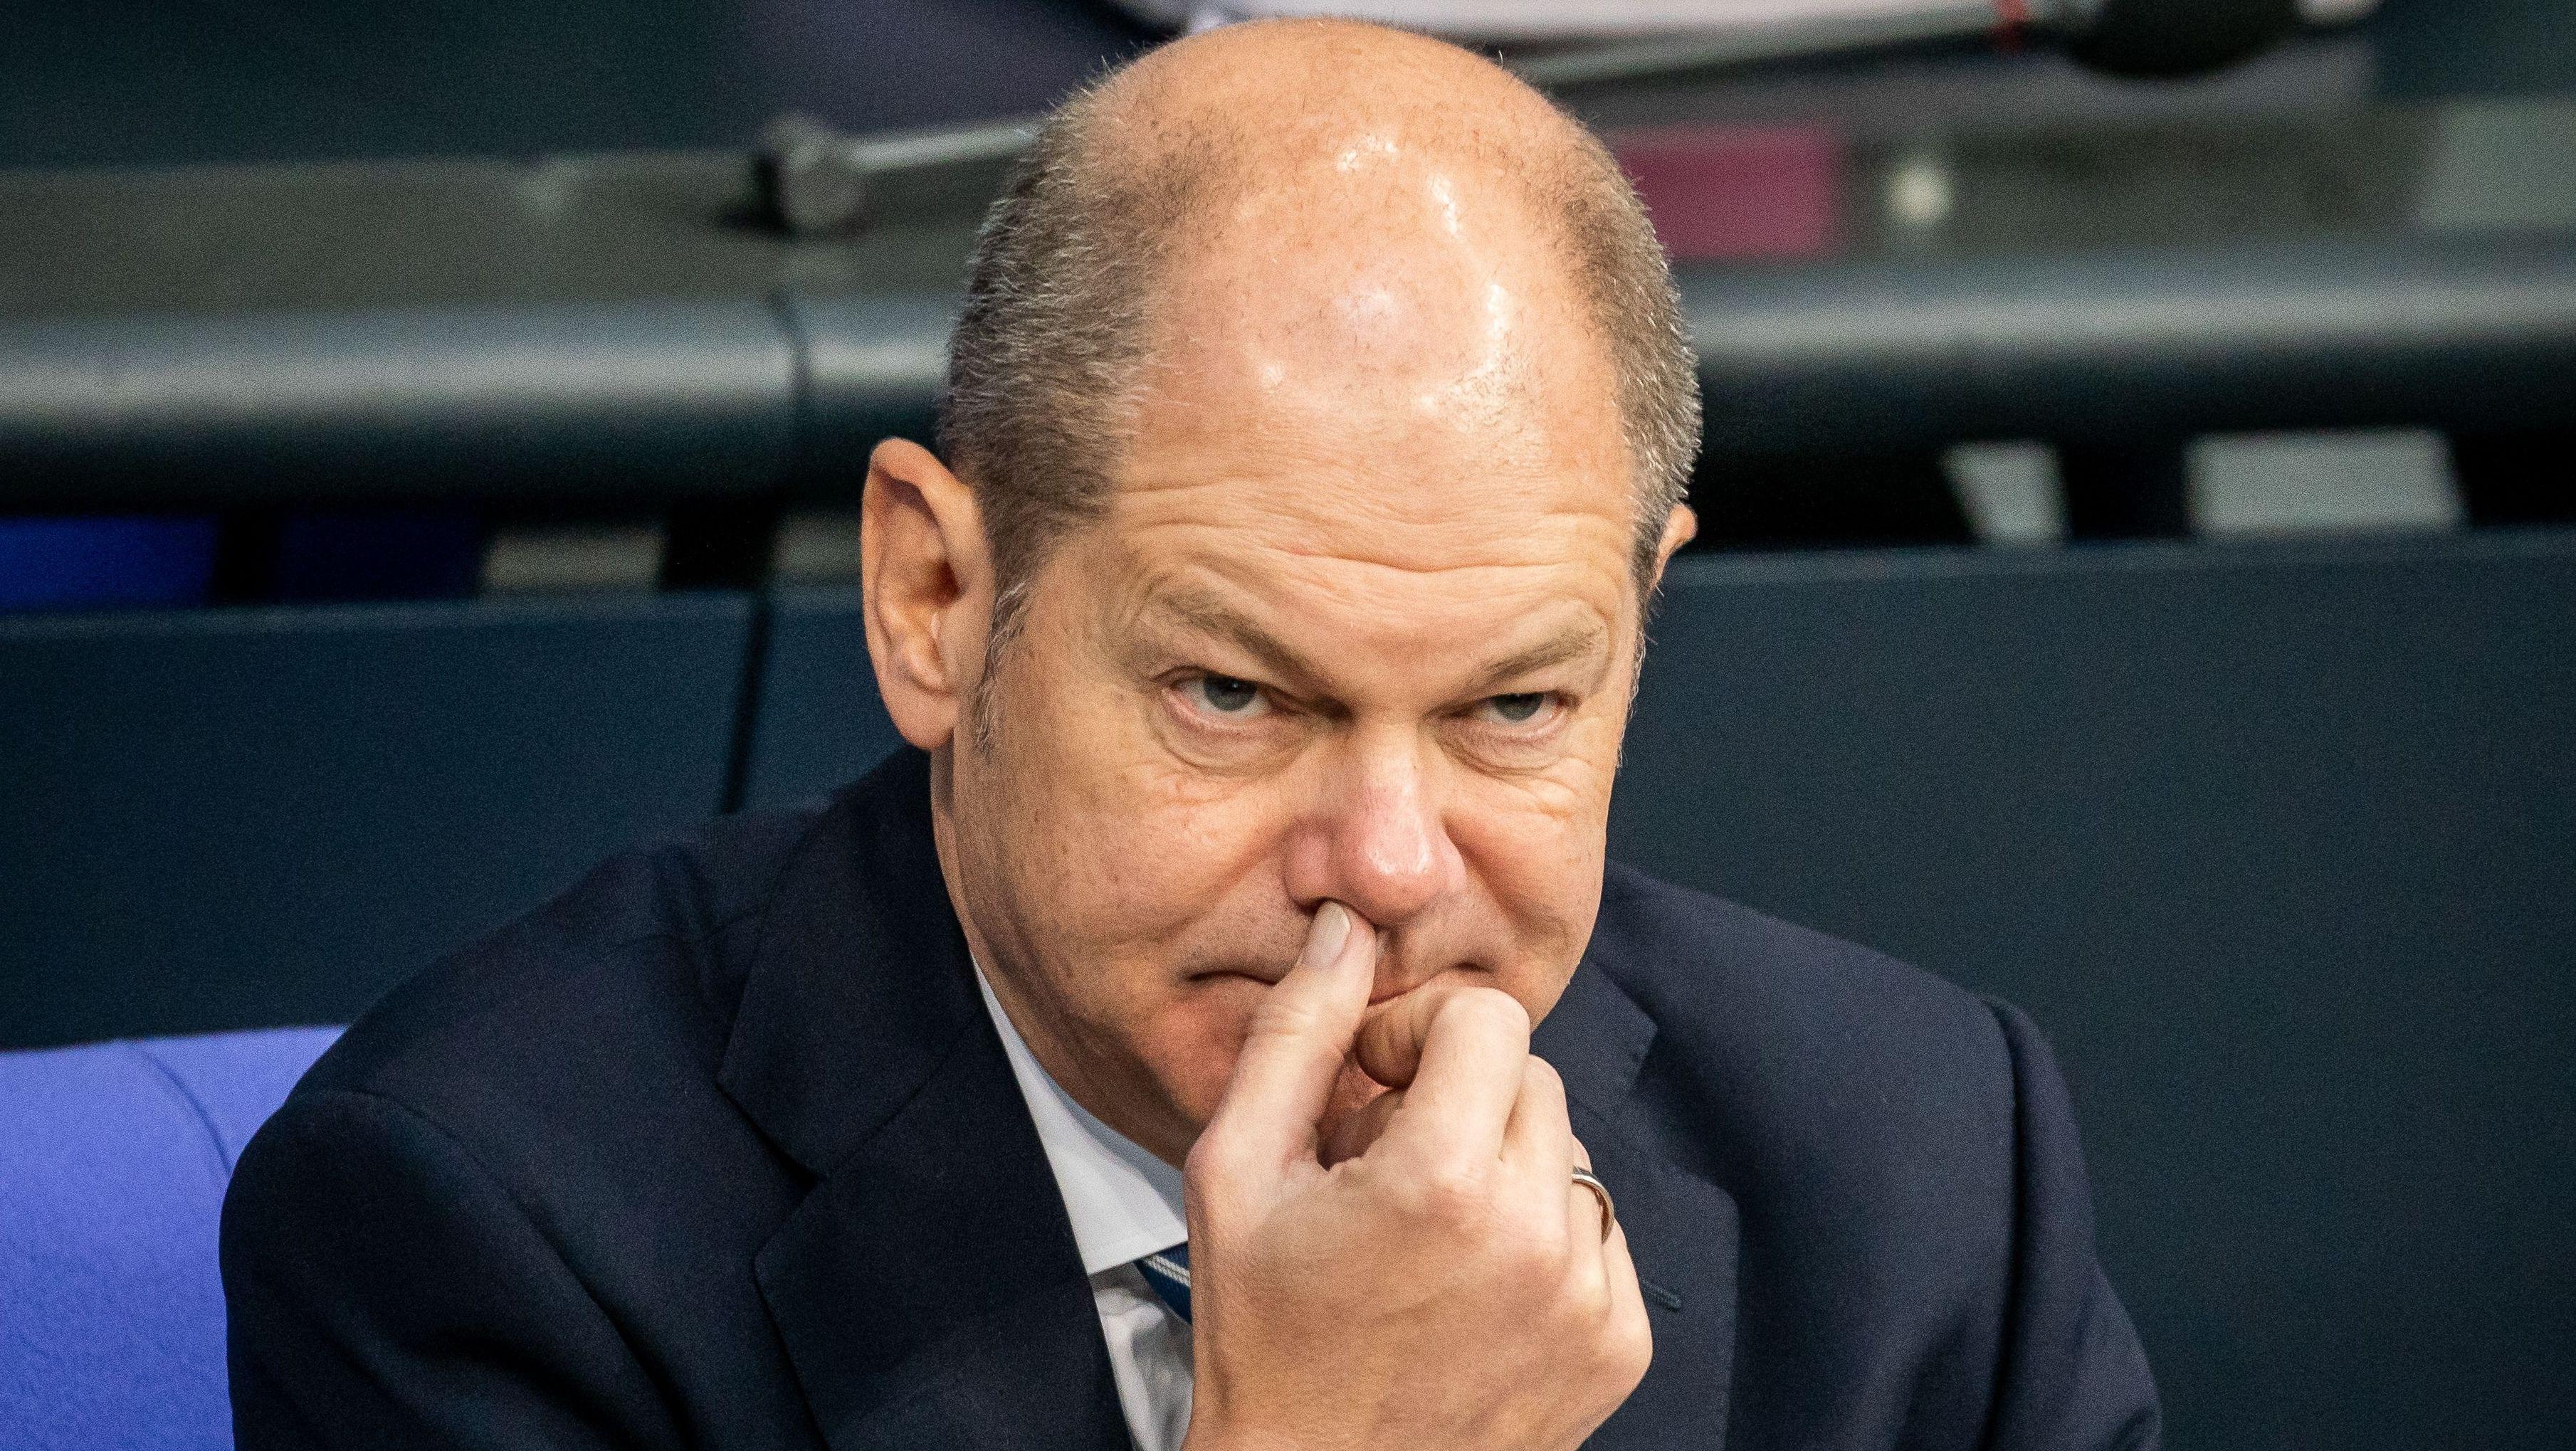 Olaf Scholz (SPD), Bundesfinanzminister